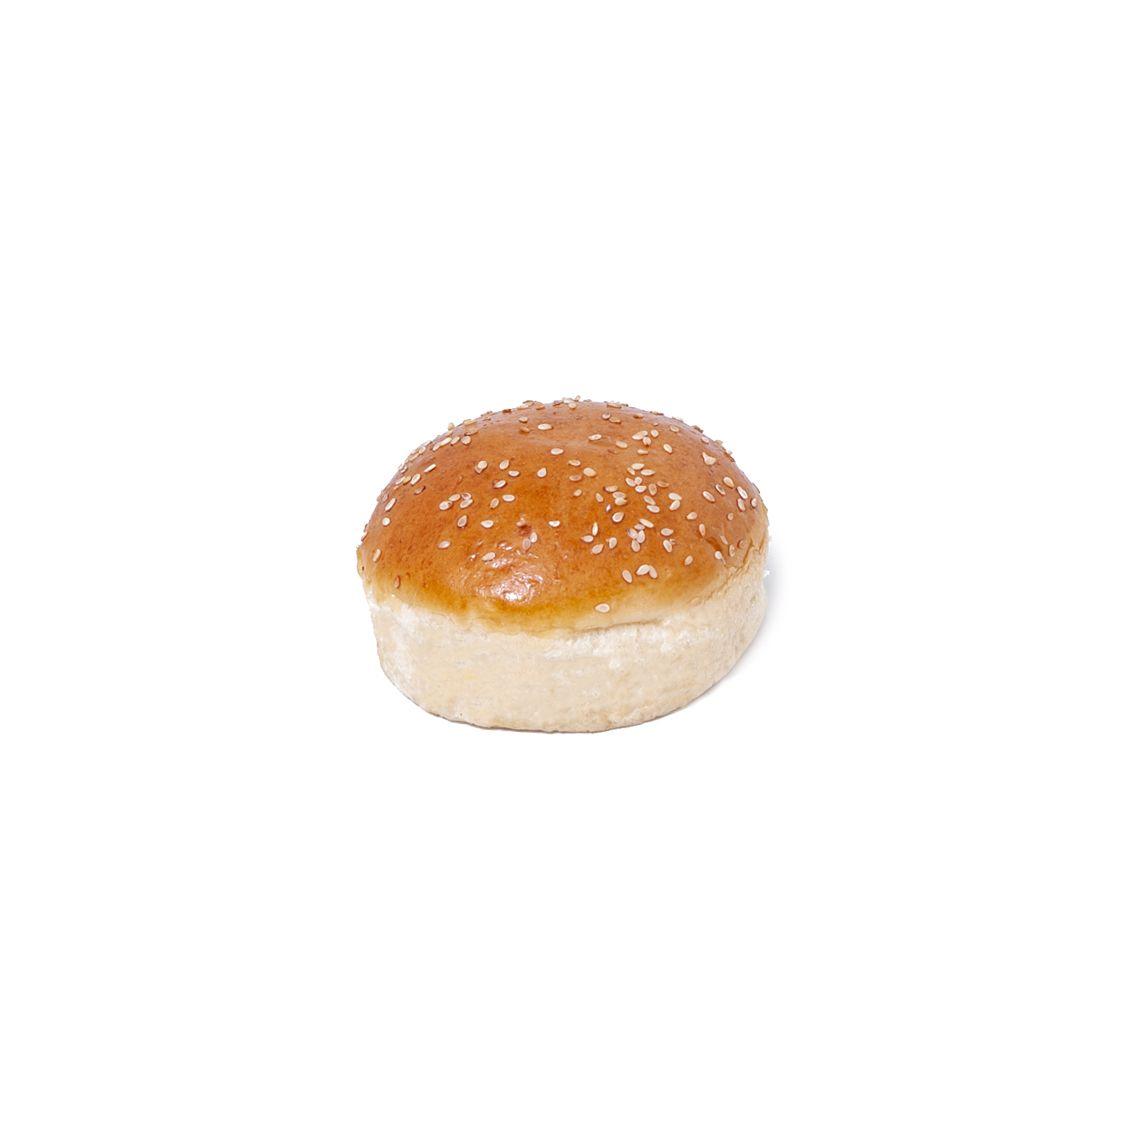 Kitchen Cuisine Default Category Burger Buns (Pack of 4)